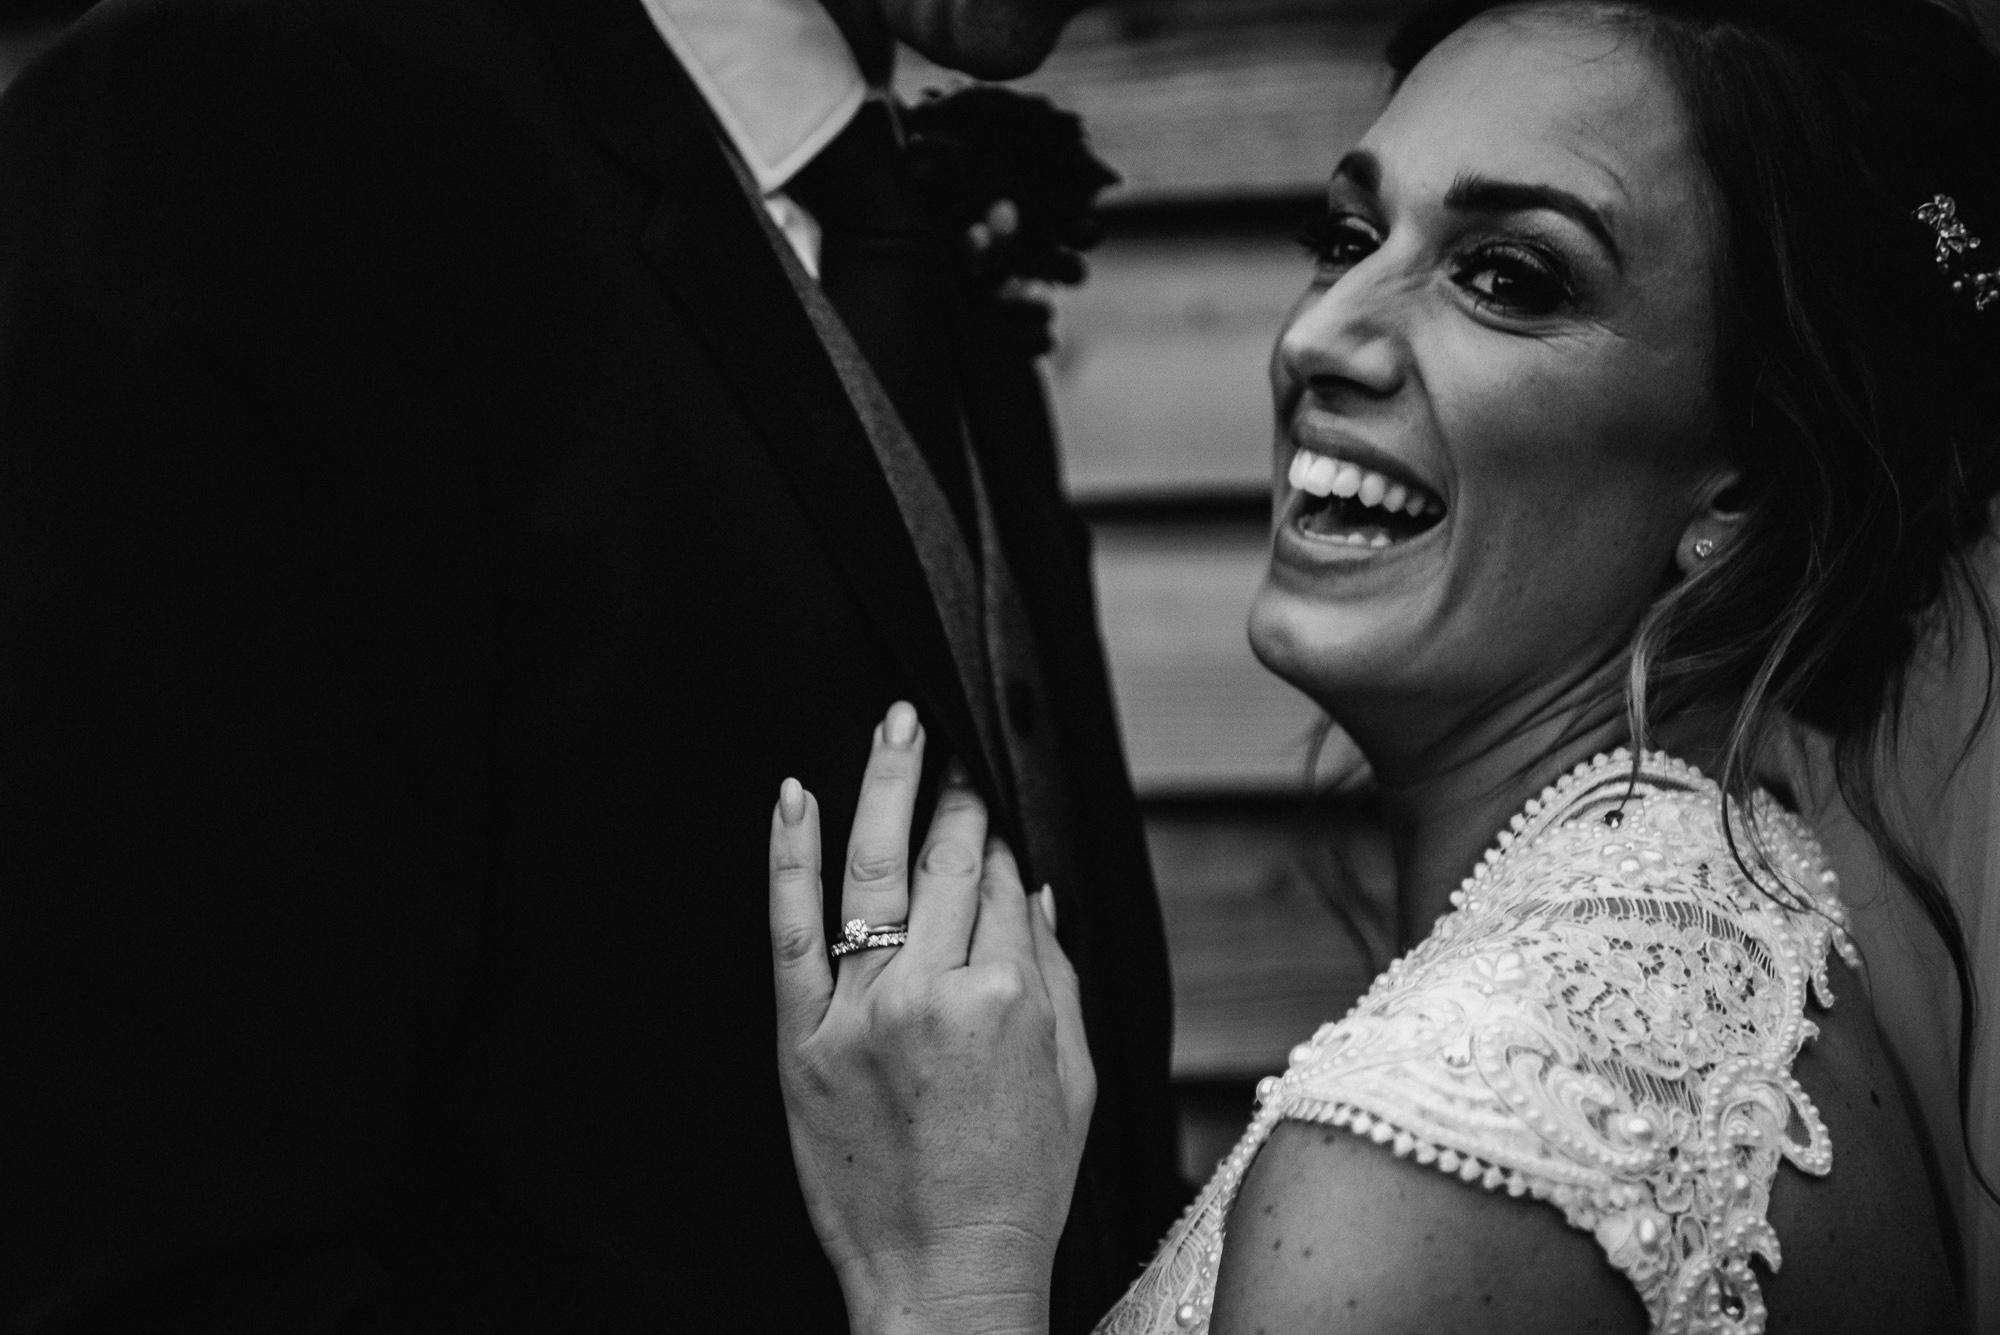 The Mill Barns Wedding Photographer Shropshire (31 of 40).jpg